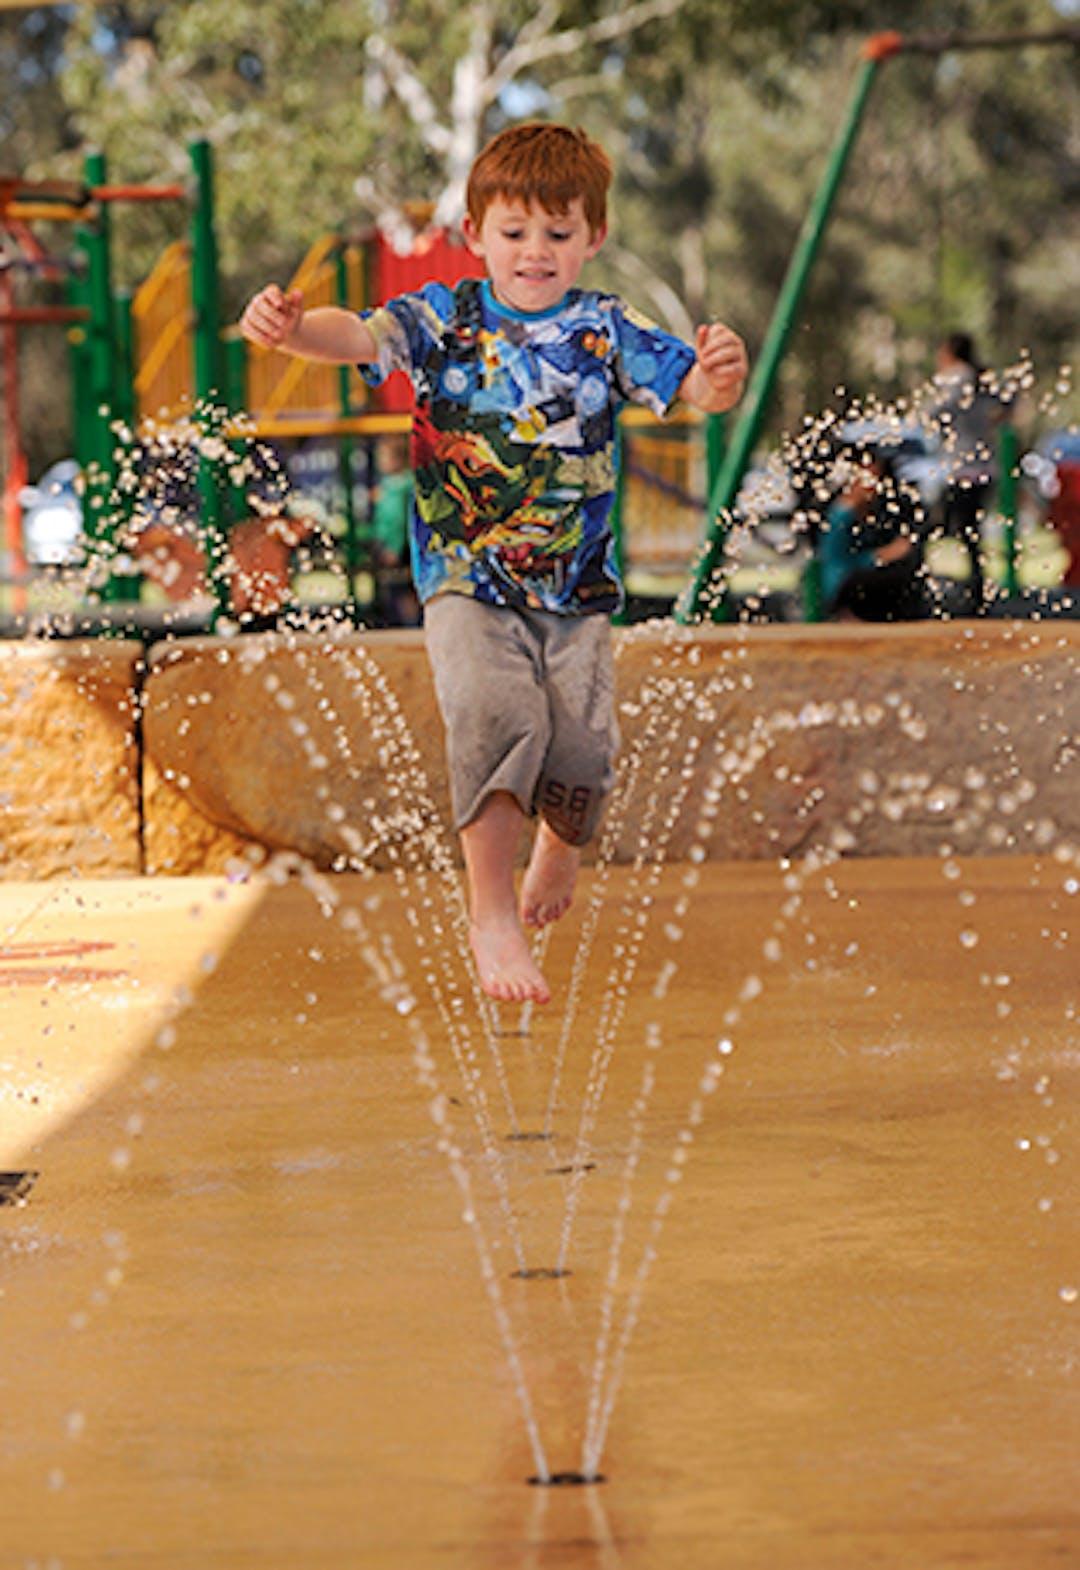 Young boy running through a water fountain